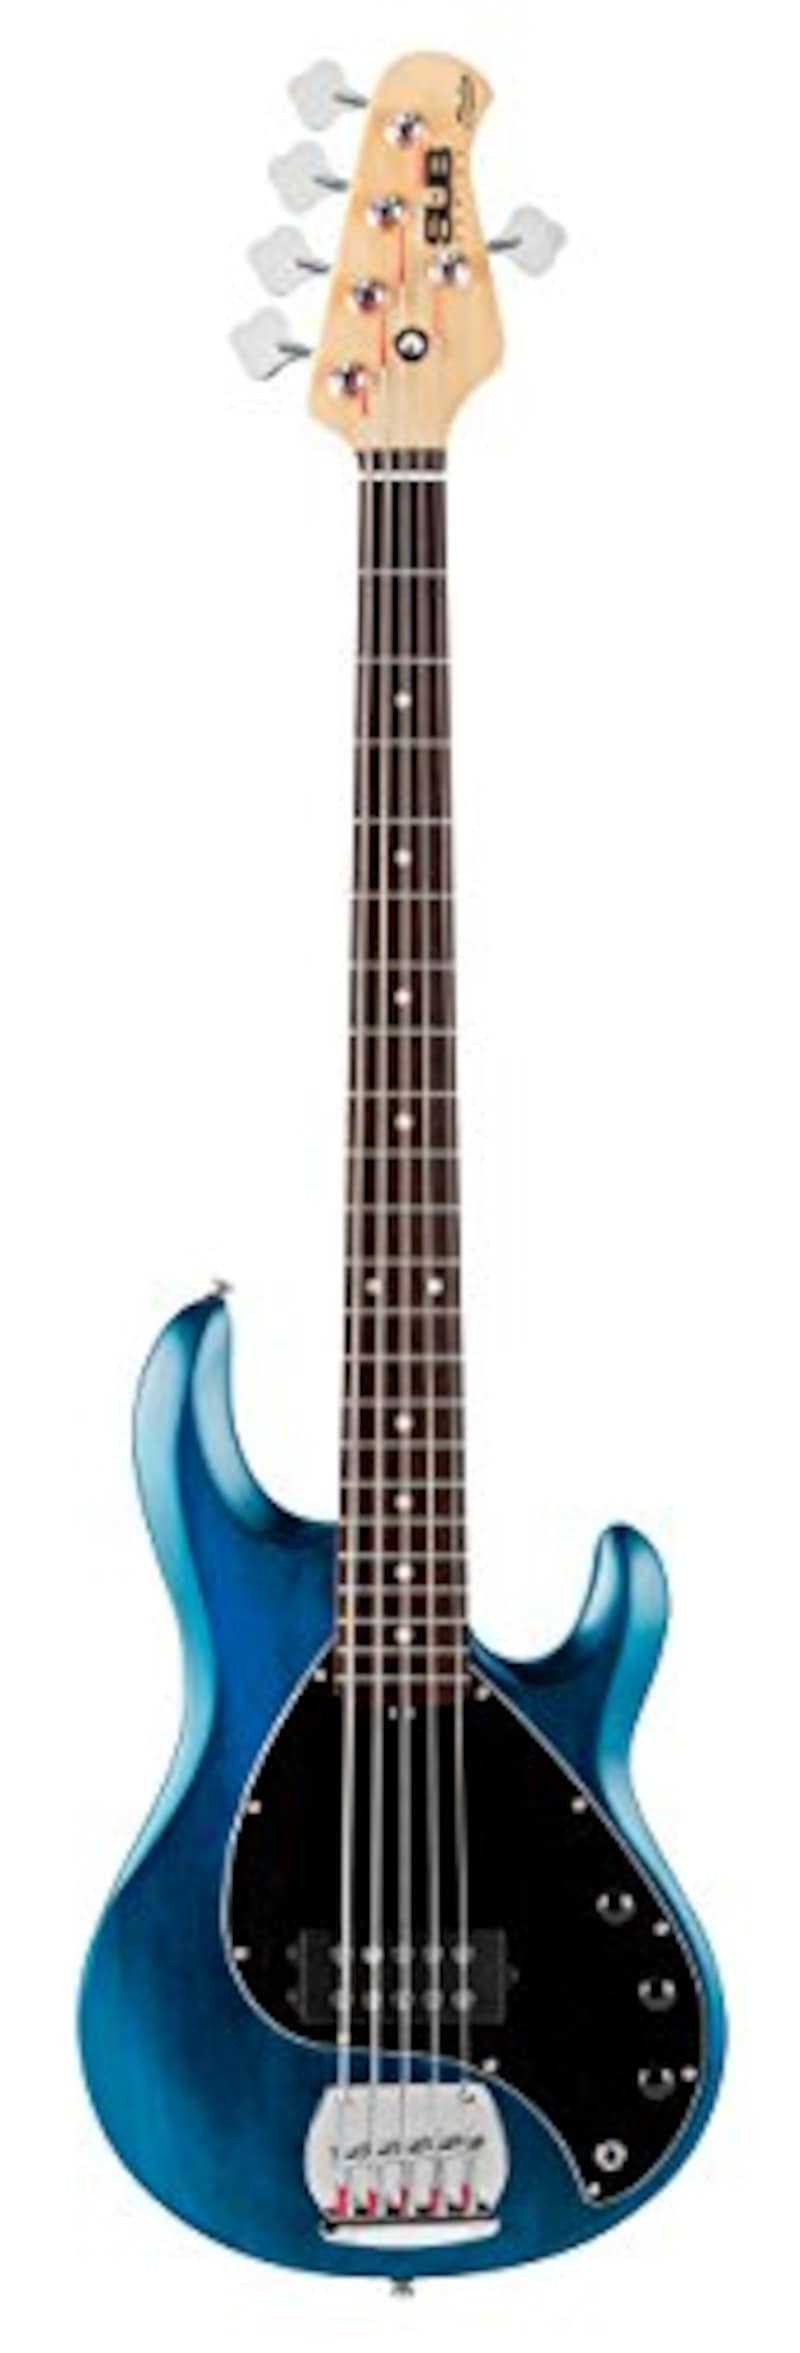 Sterling by MUSIC MAN ,S.U.B.SERIES Ray5 Trans Blue Stain 5弦エレキベース